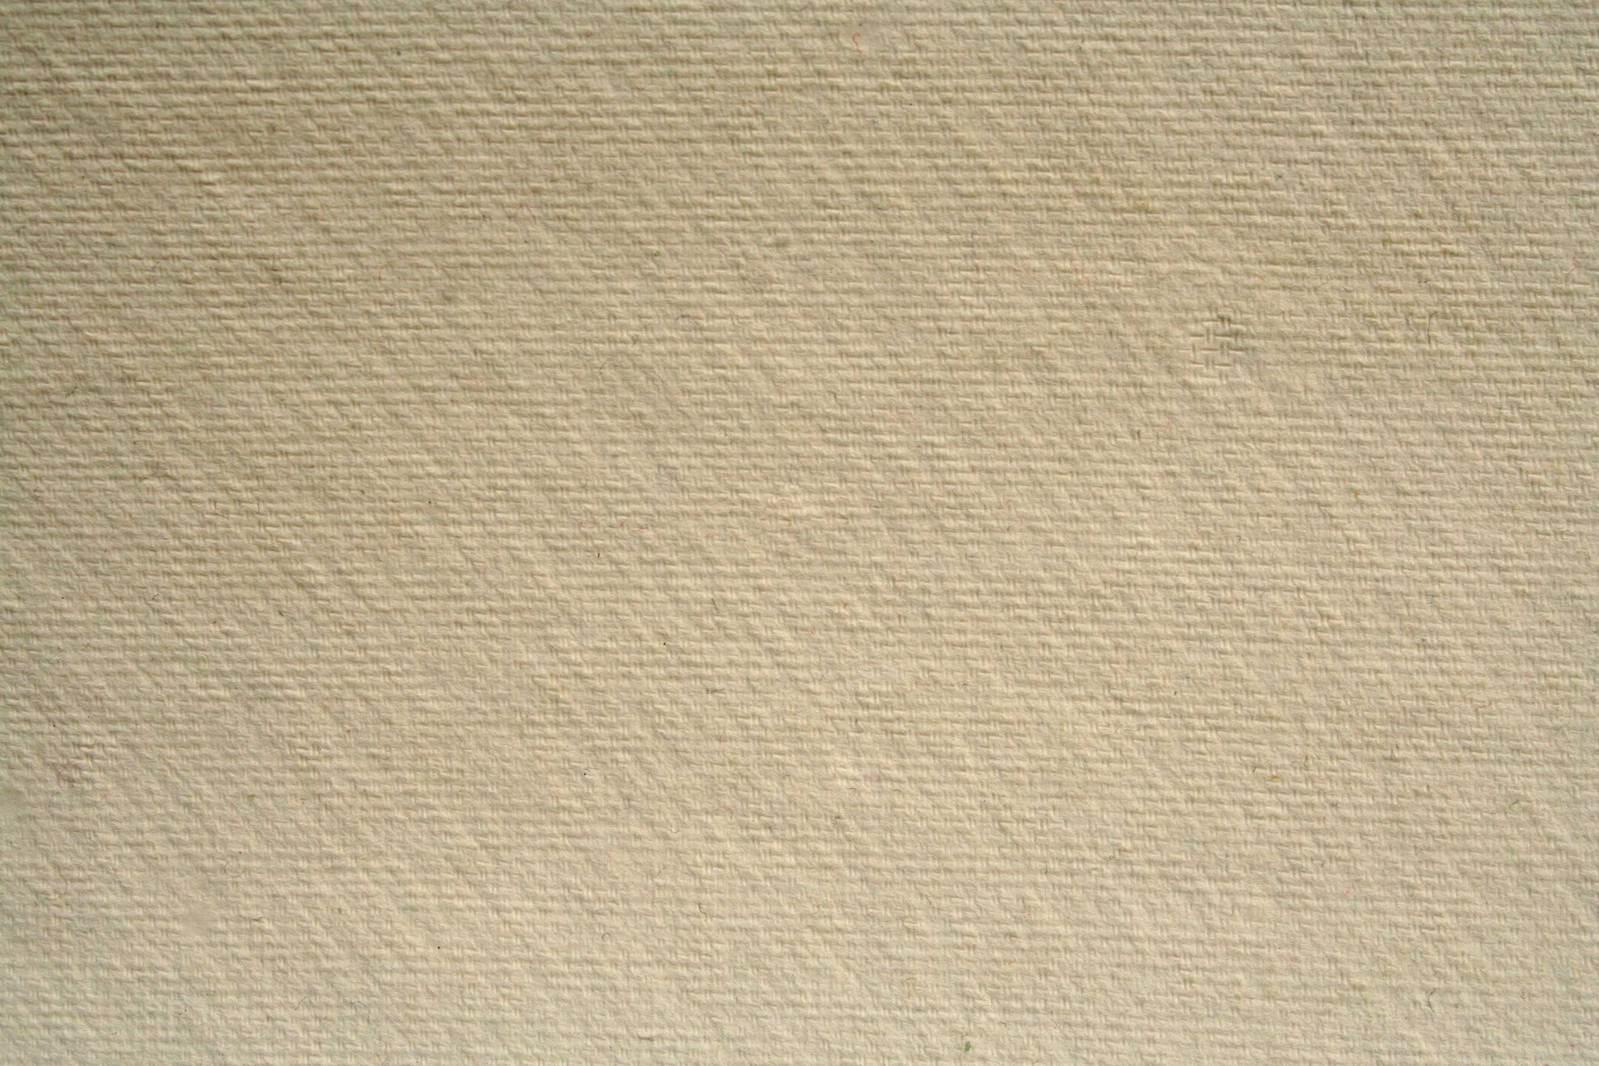 Free Handmade paper texture Stock Photo - FreeImages.com